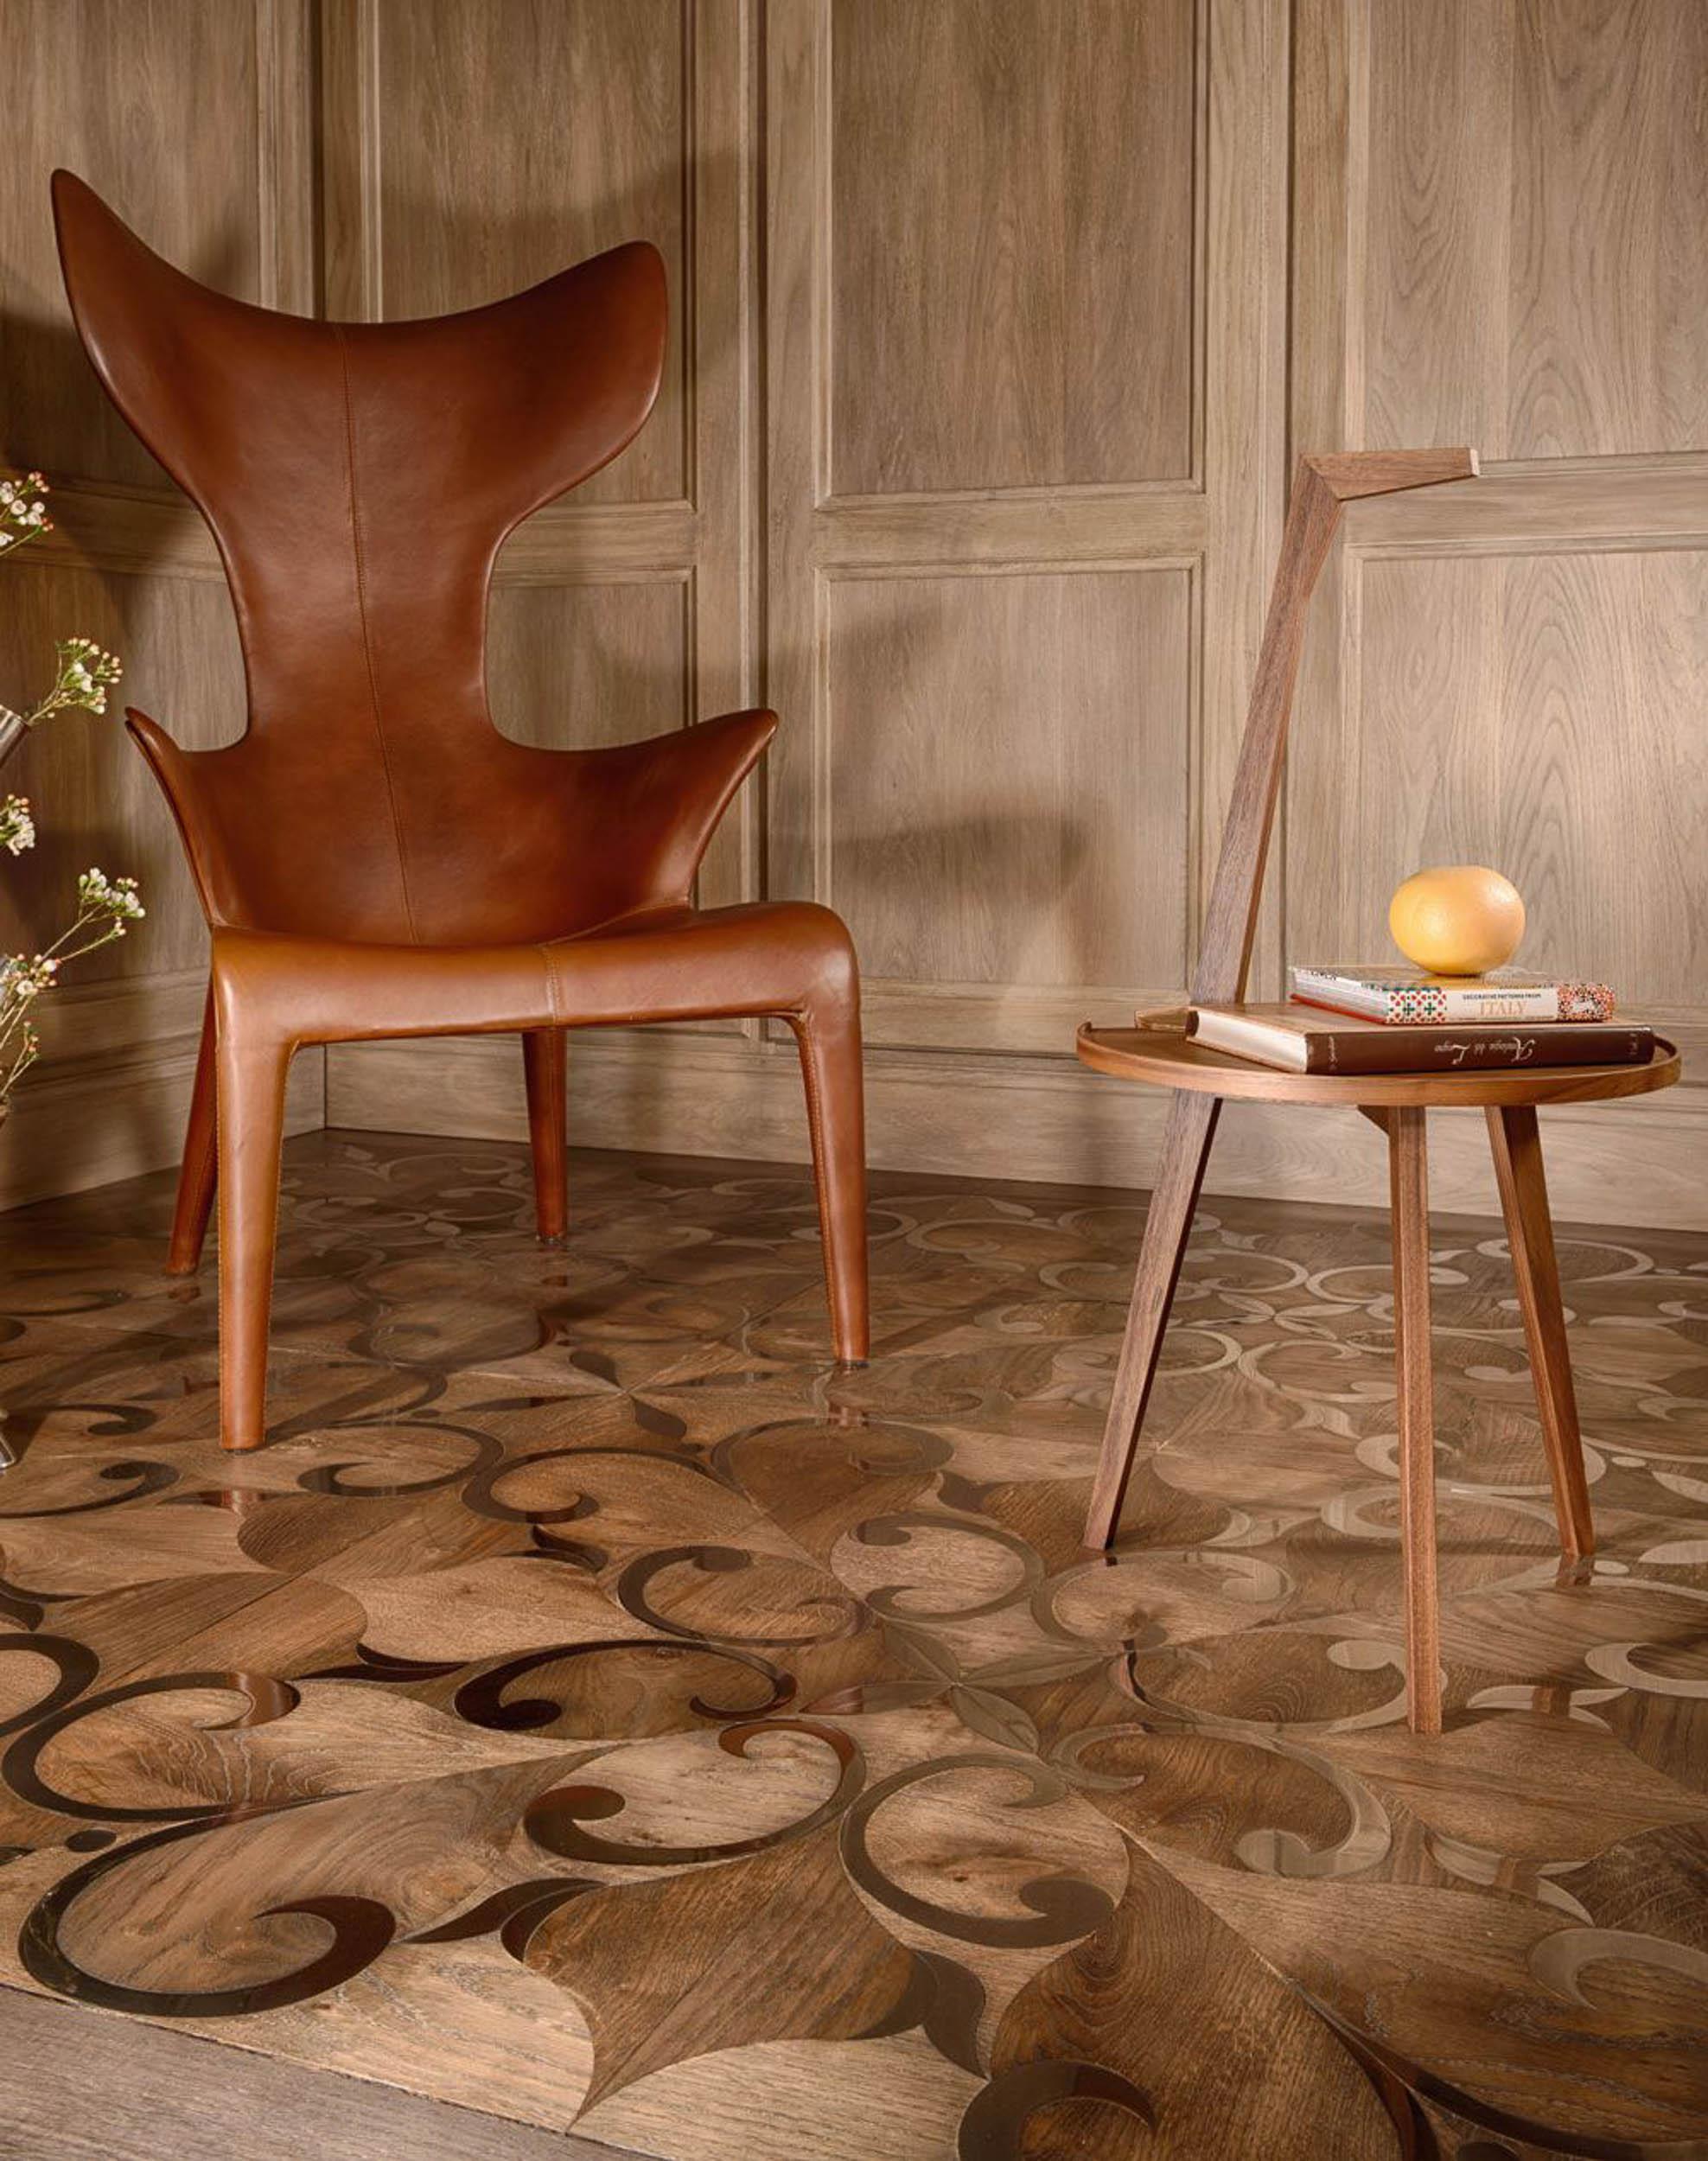 marquetry wood flooring